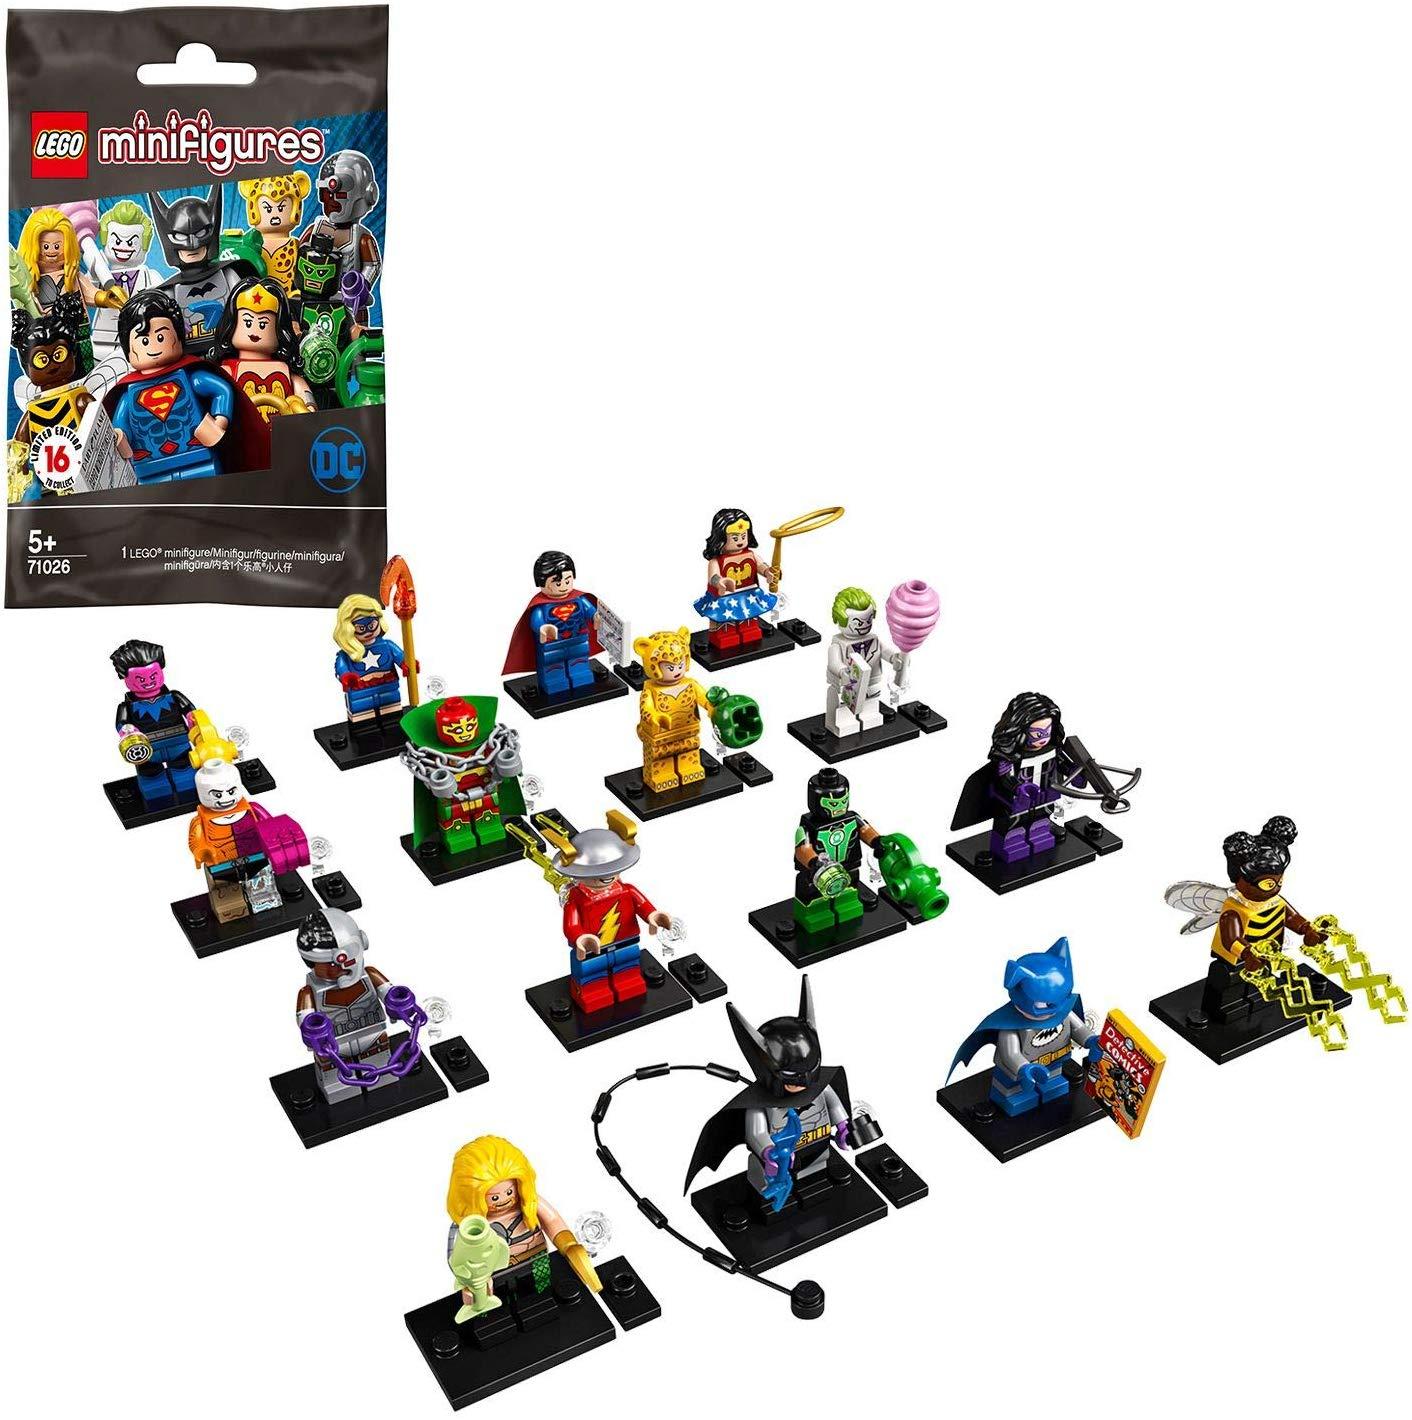 LEGO 71026 Minifigures DC Super Heroes Series £2.49 (Prime) + £4.49 (non Prime) at Amazon